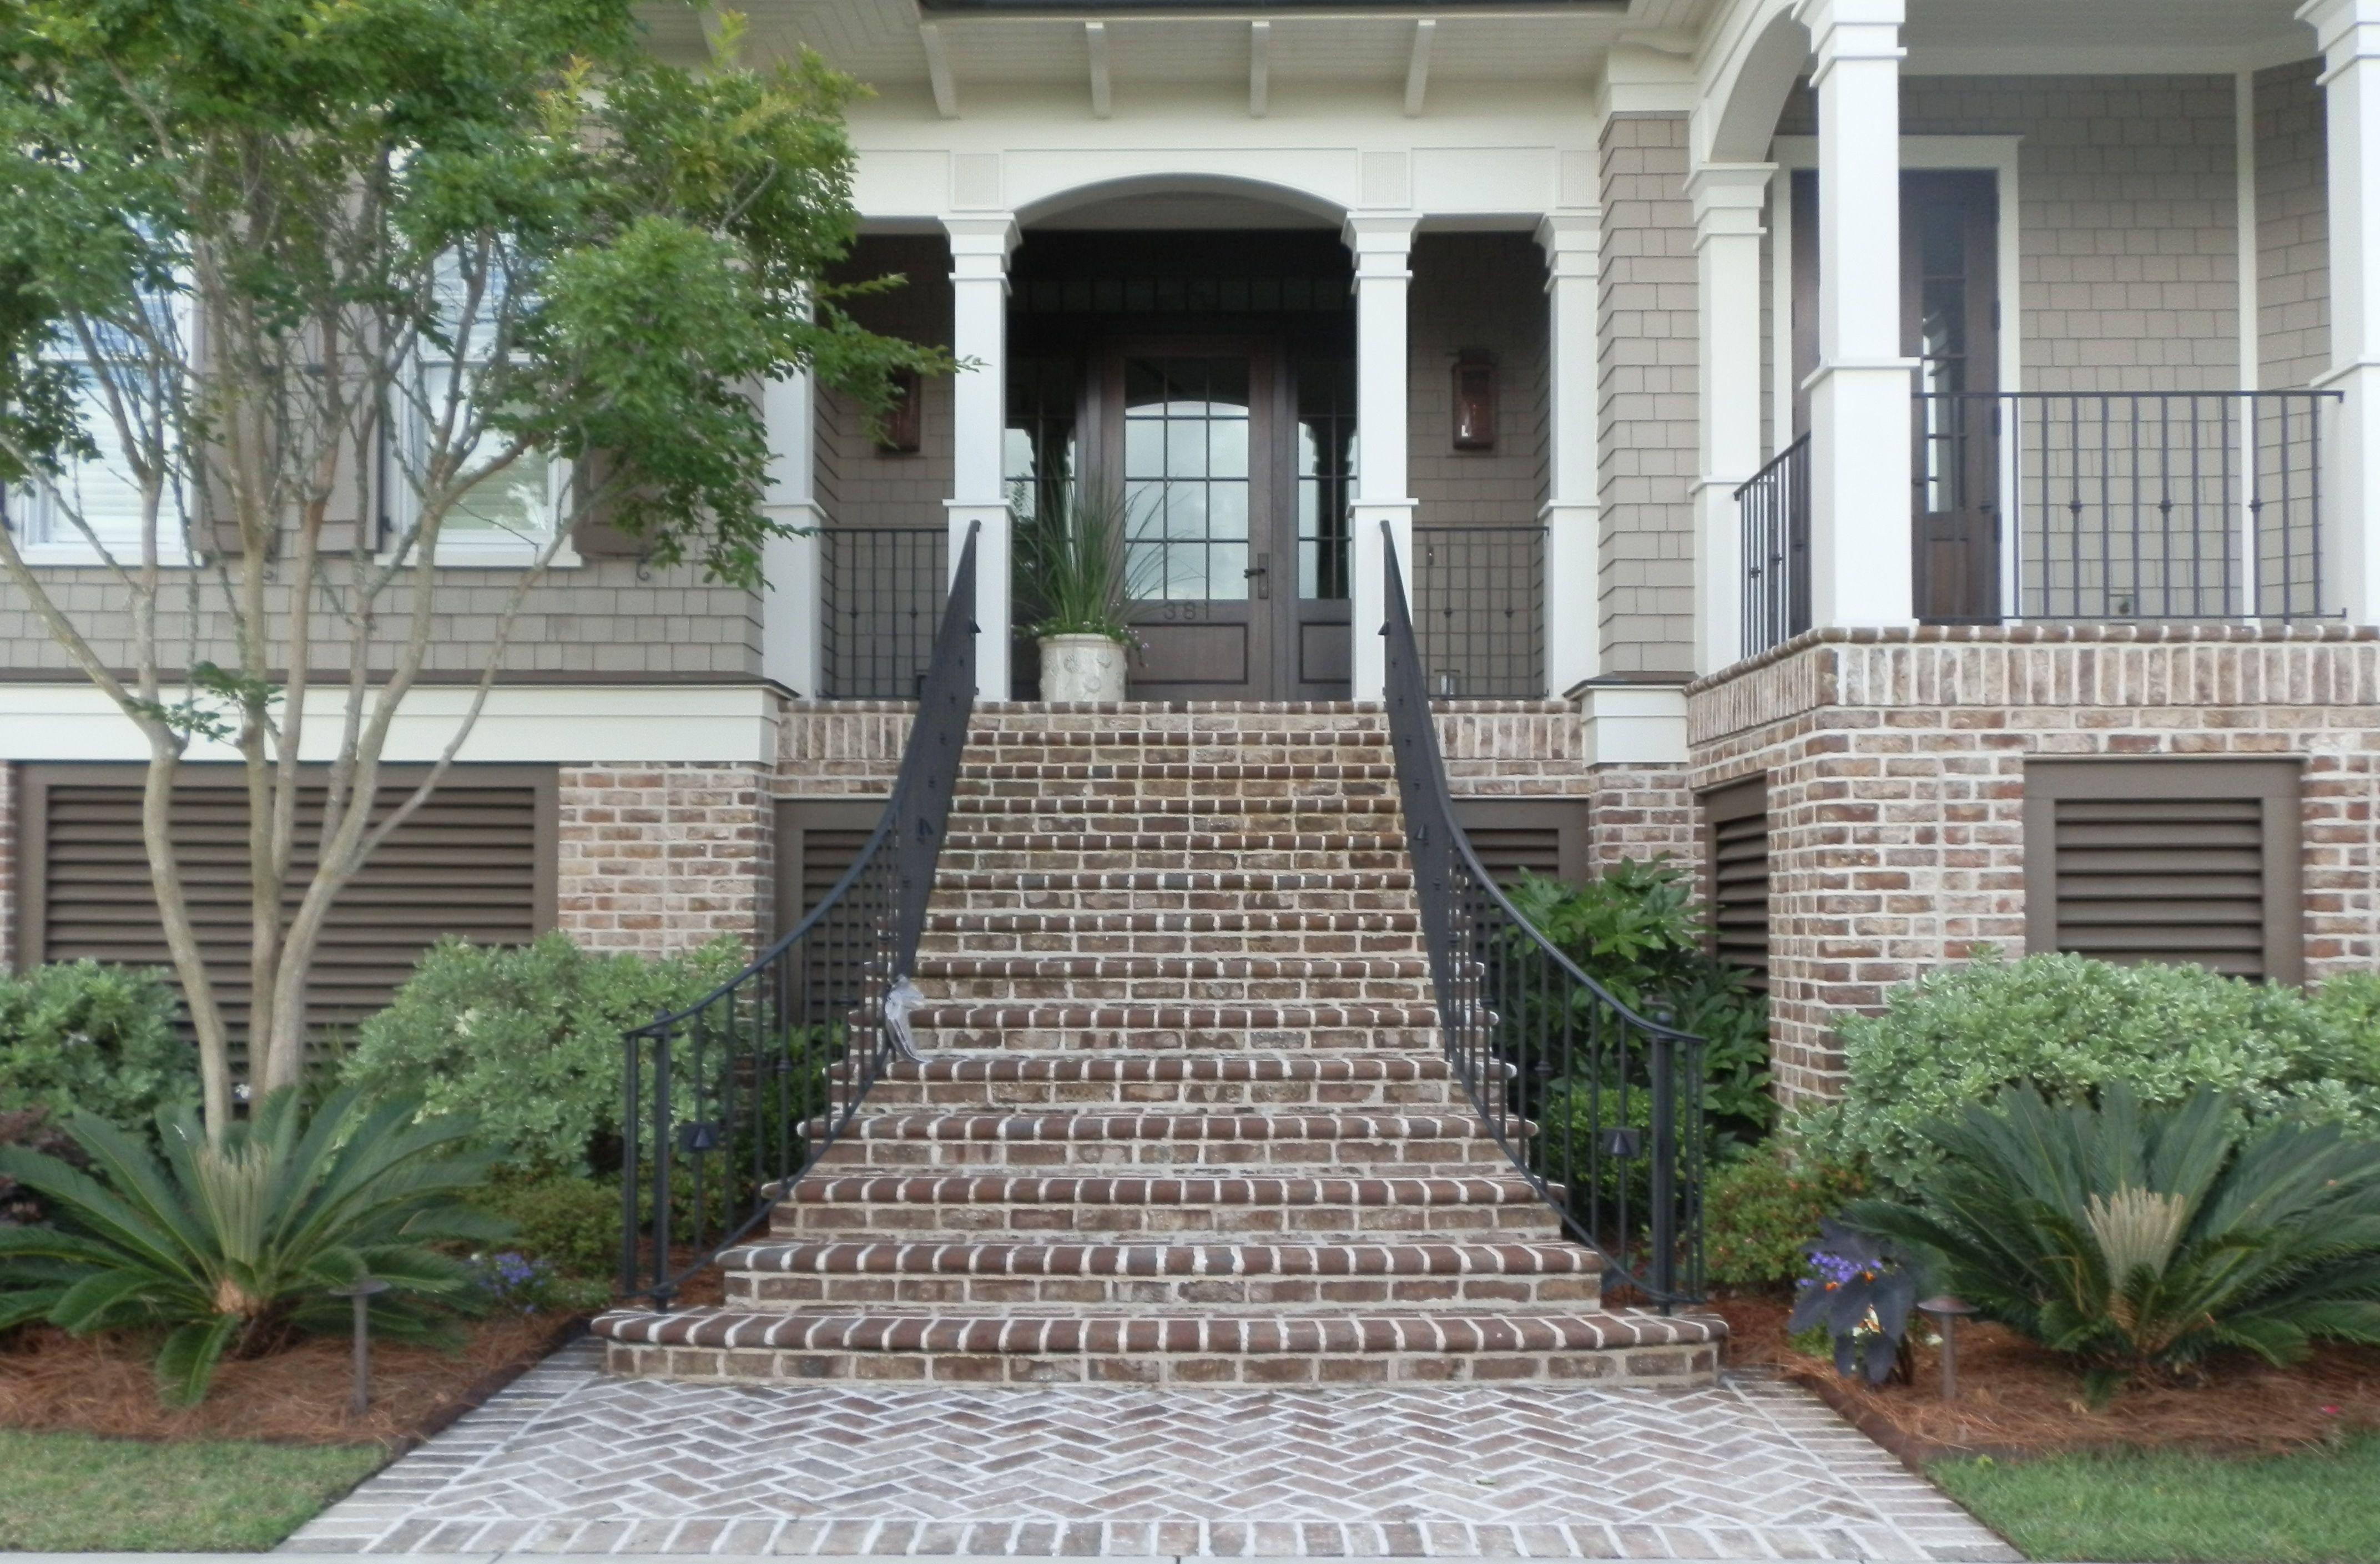 Savannah Grey Handmade Brick On Charleston Sc Residence Www Handmadebrick Com Exterior Brick Brick Steps House Exterior